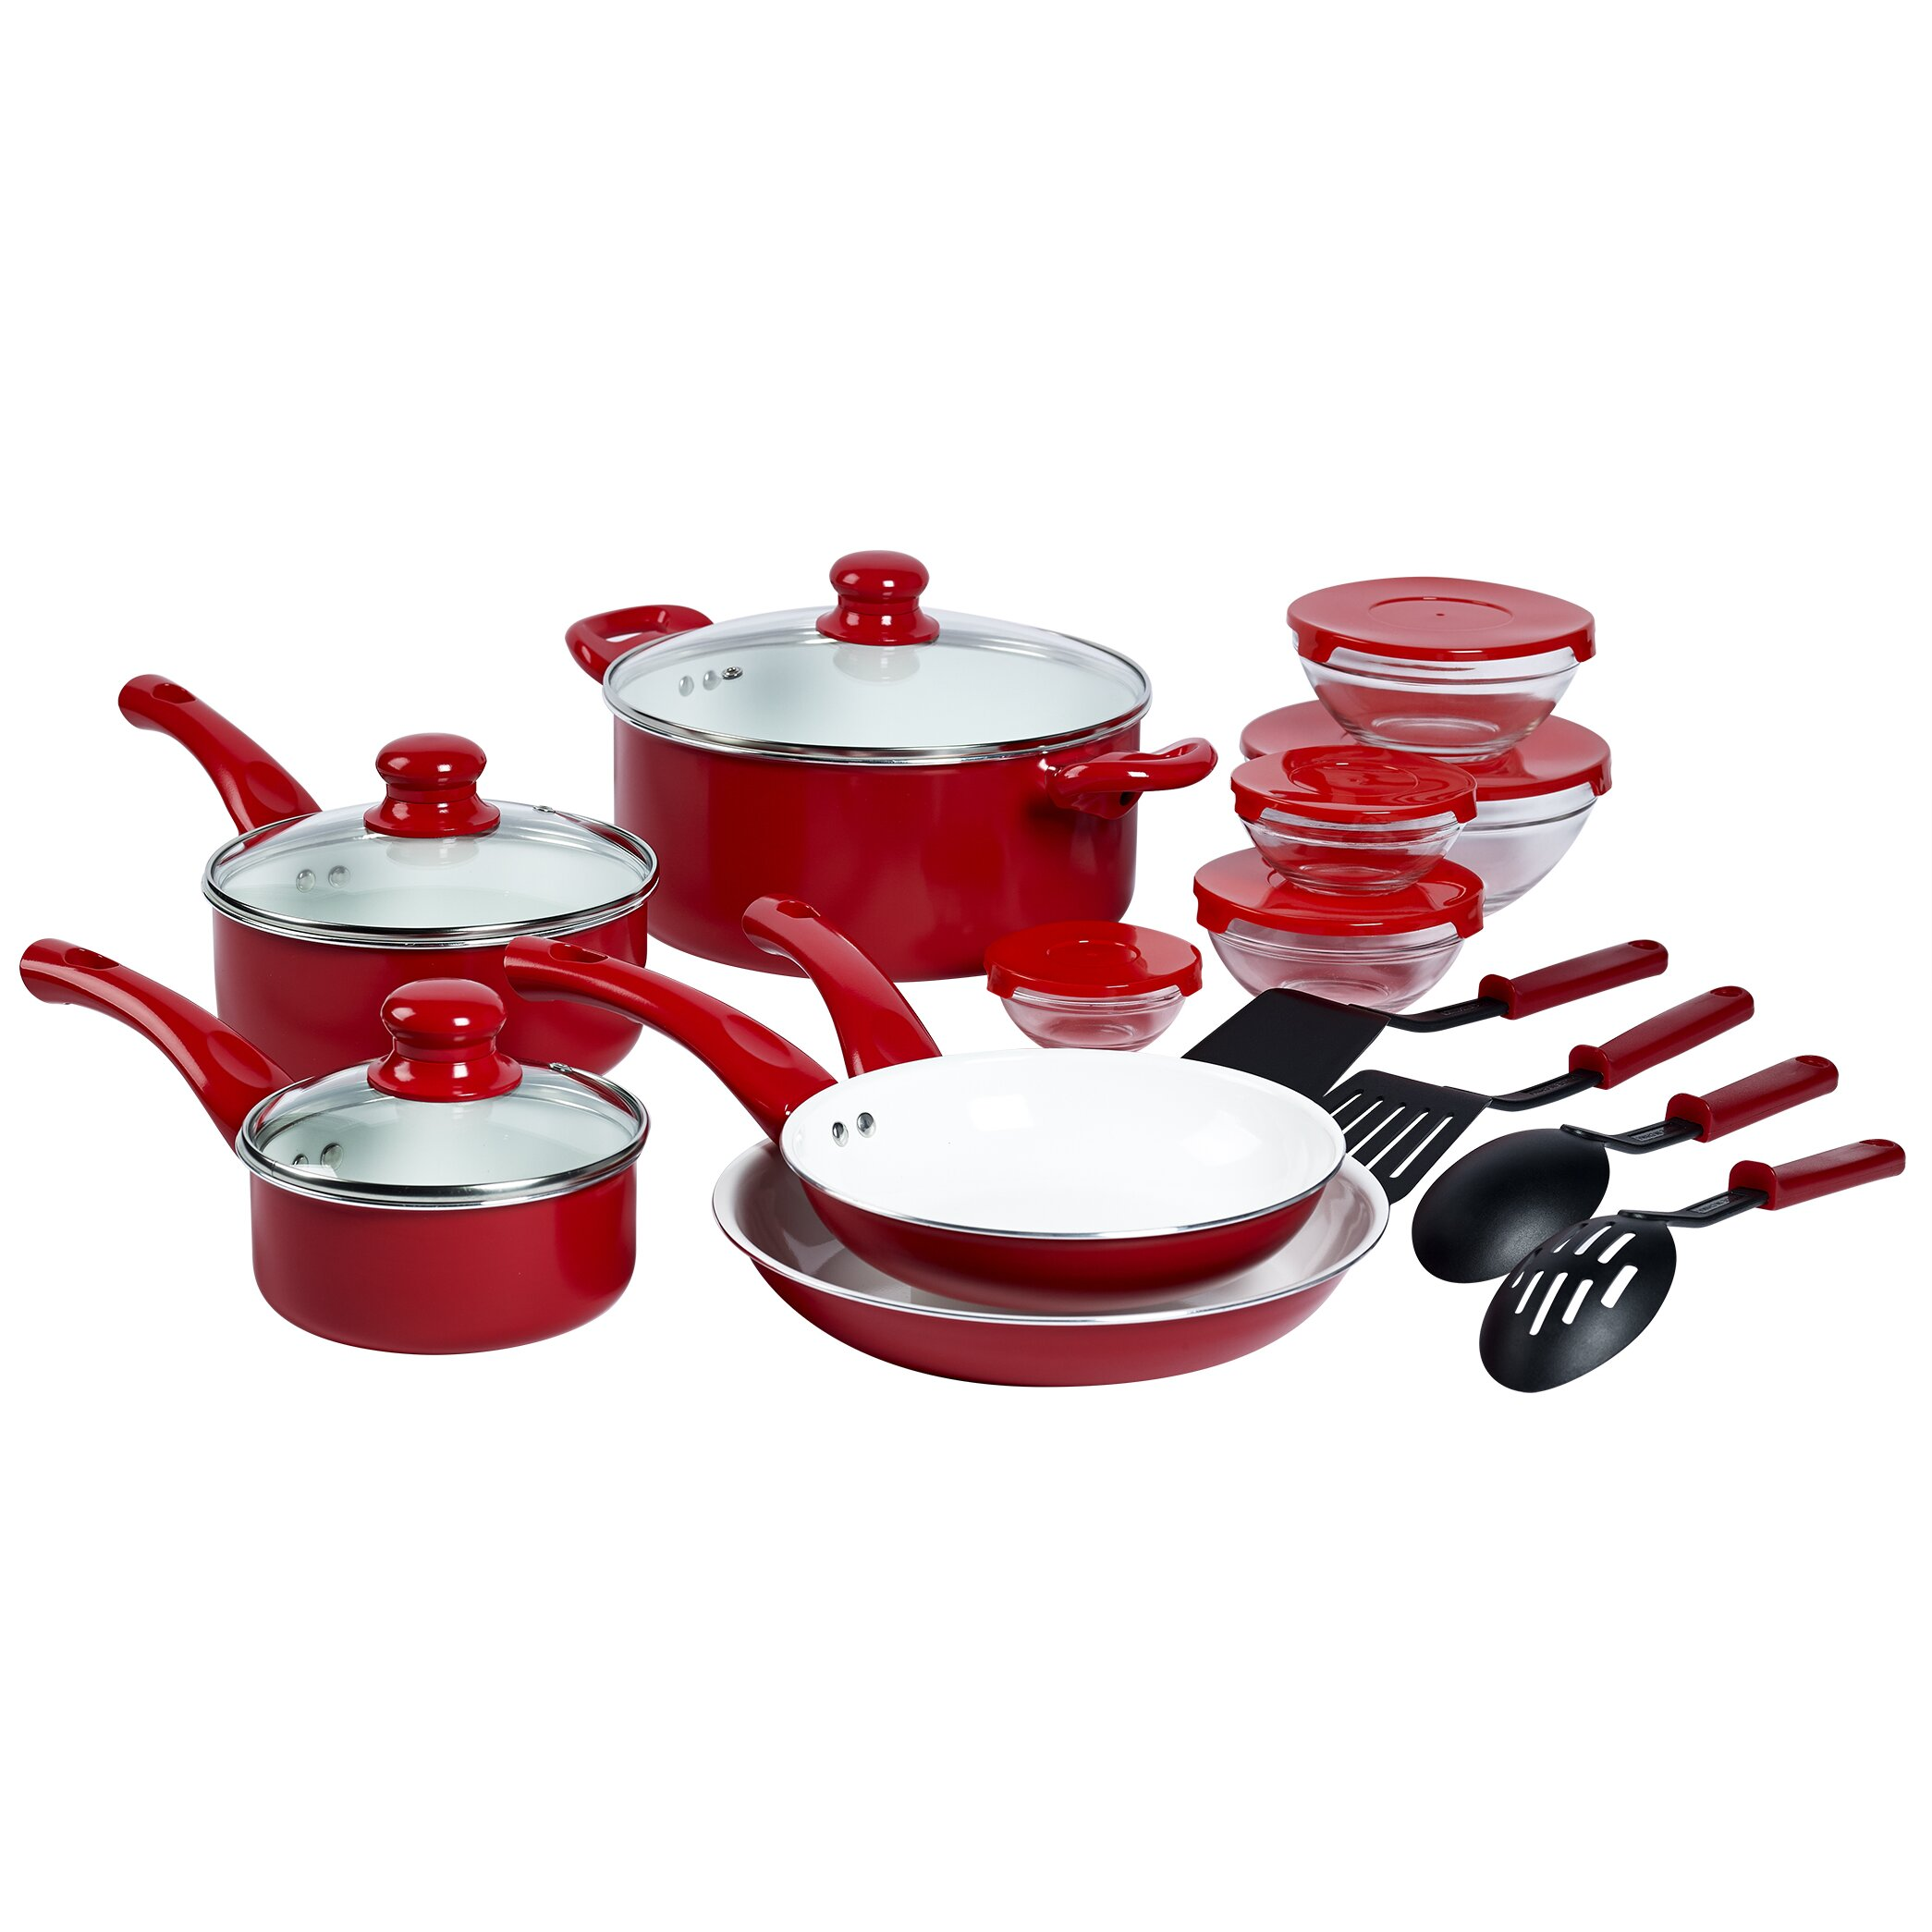 Basic Essentials Aluminum 17 Piece Cookware Set Reviews